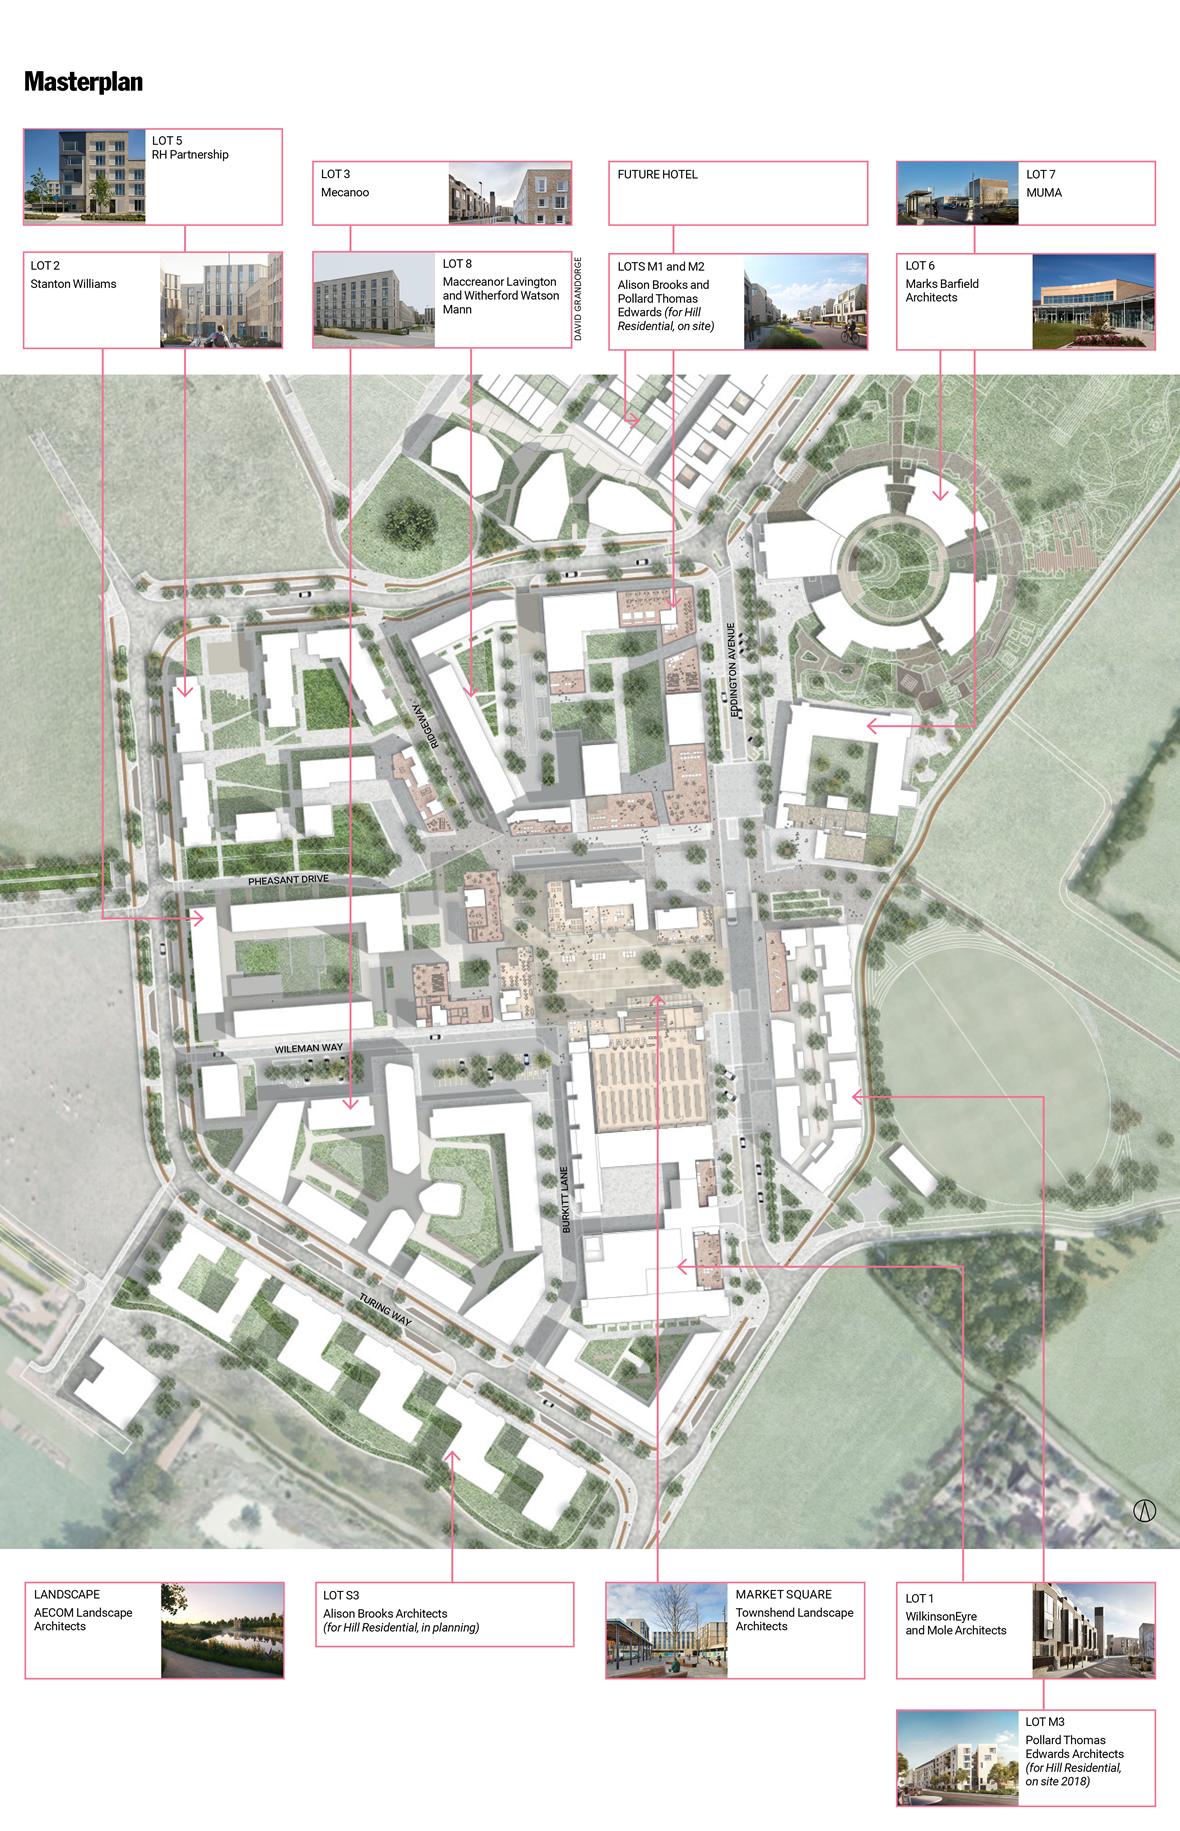 North West Cambridge: A brave new world | Urban landscape ...